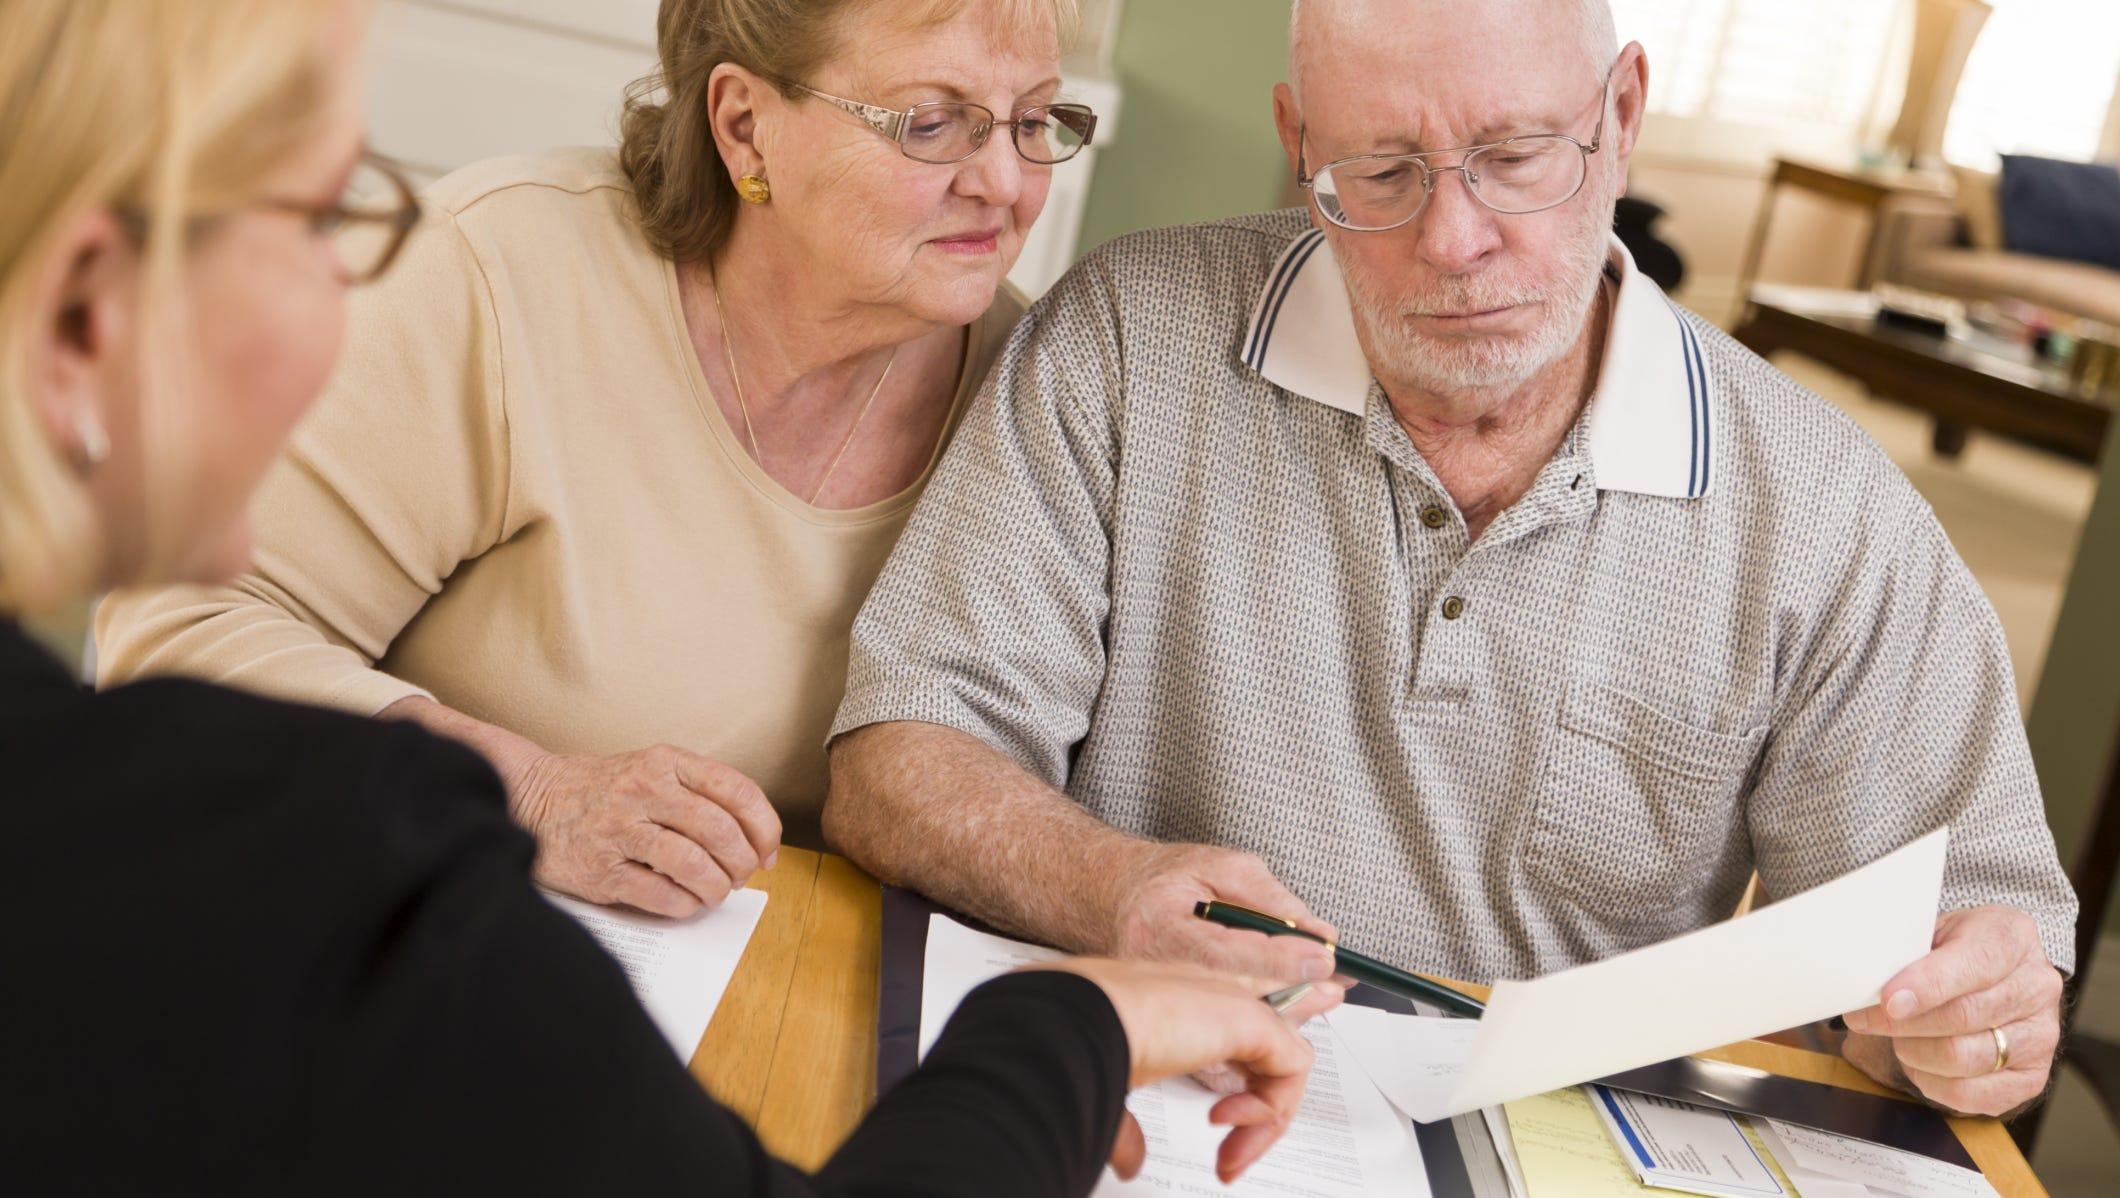 How Do I Pick an Unbiased, Helpful Medicare Adviser?